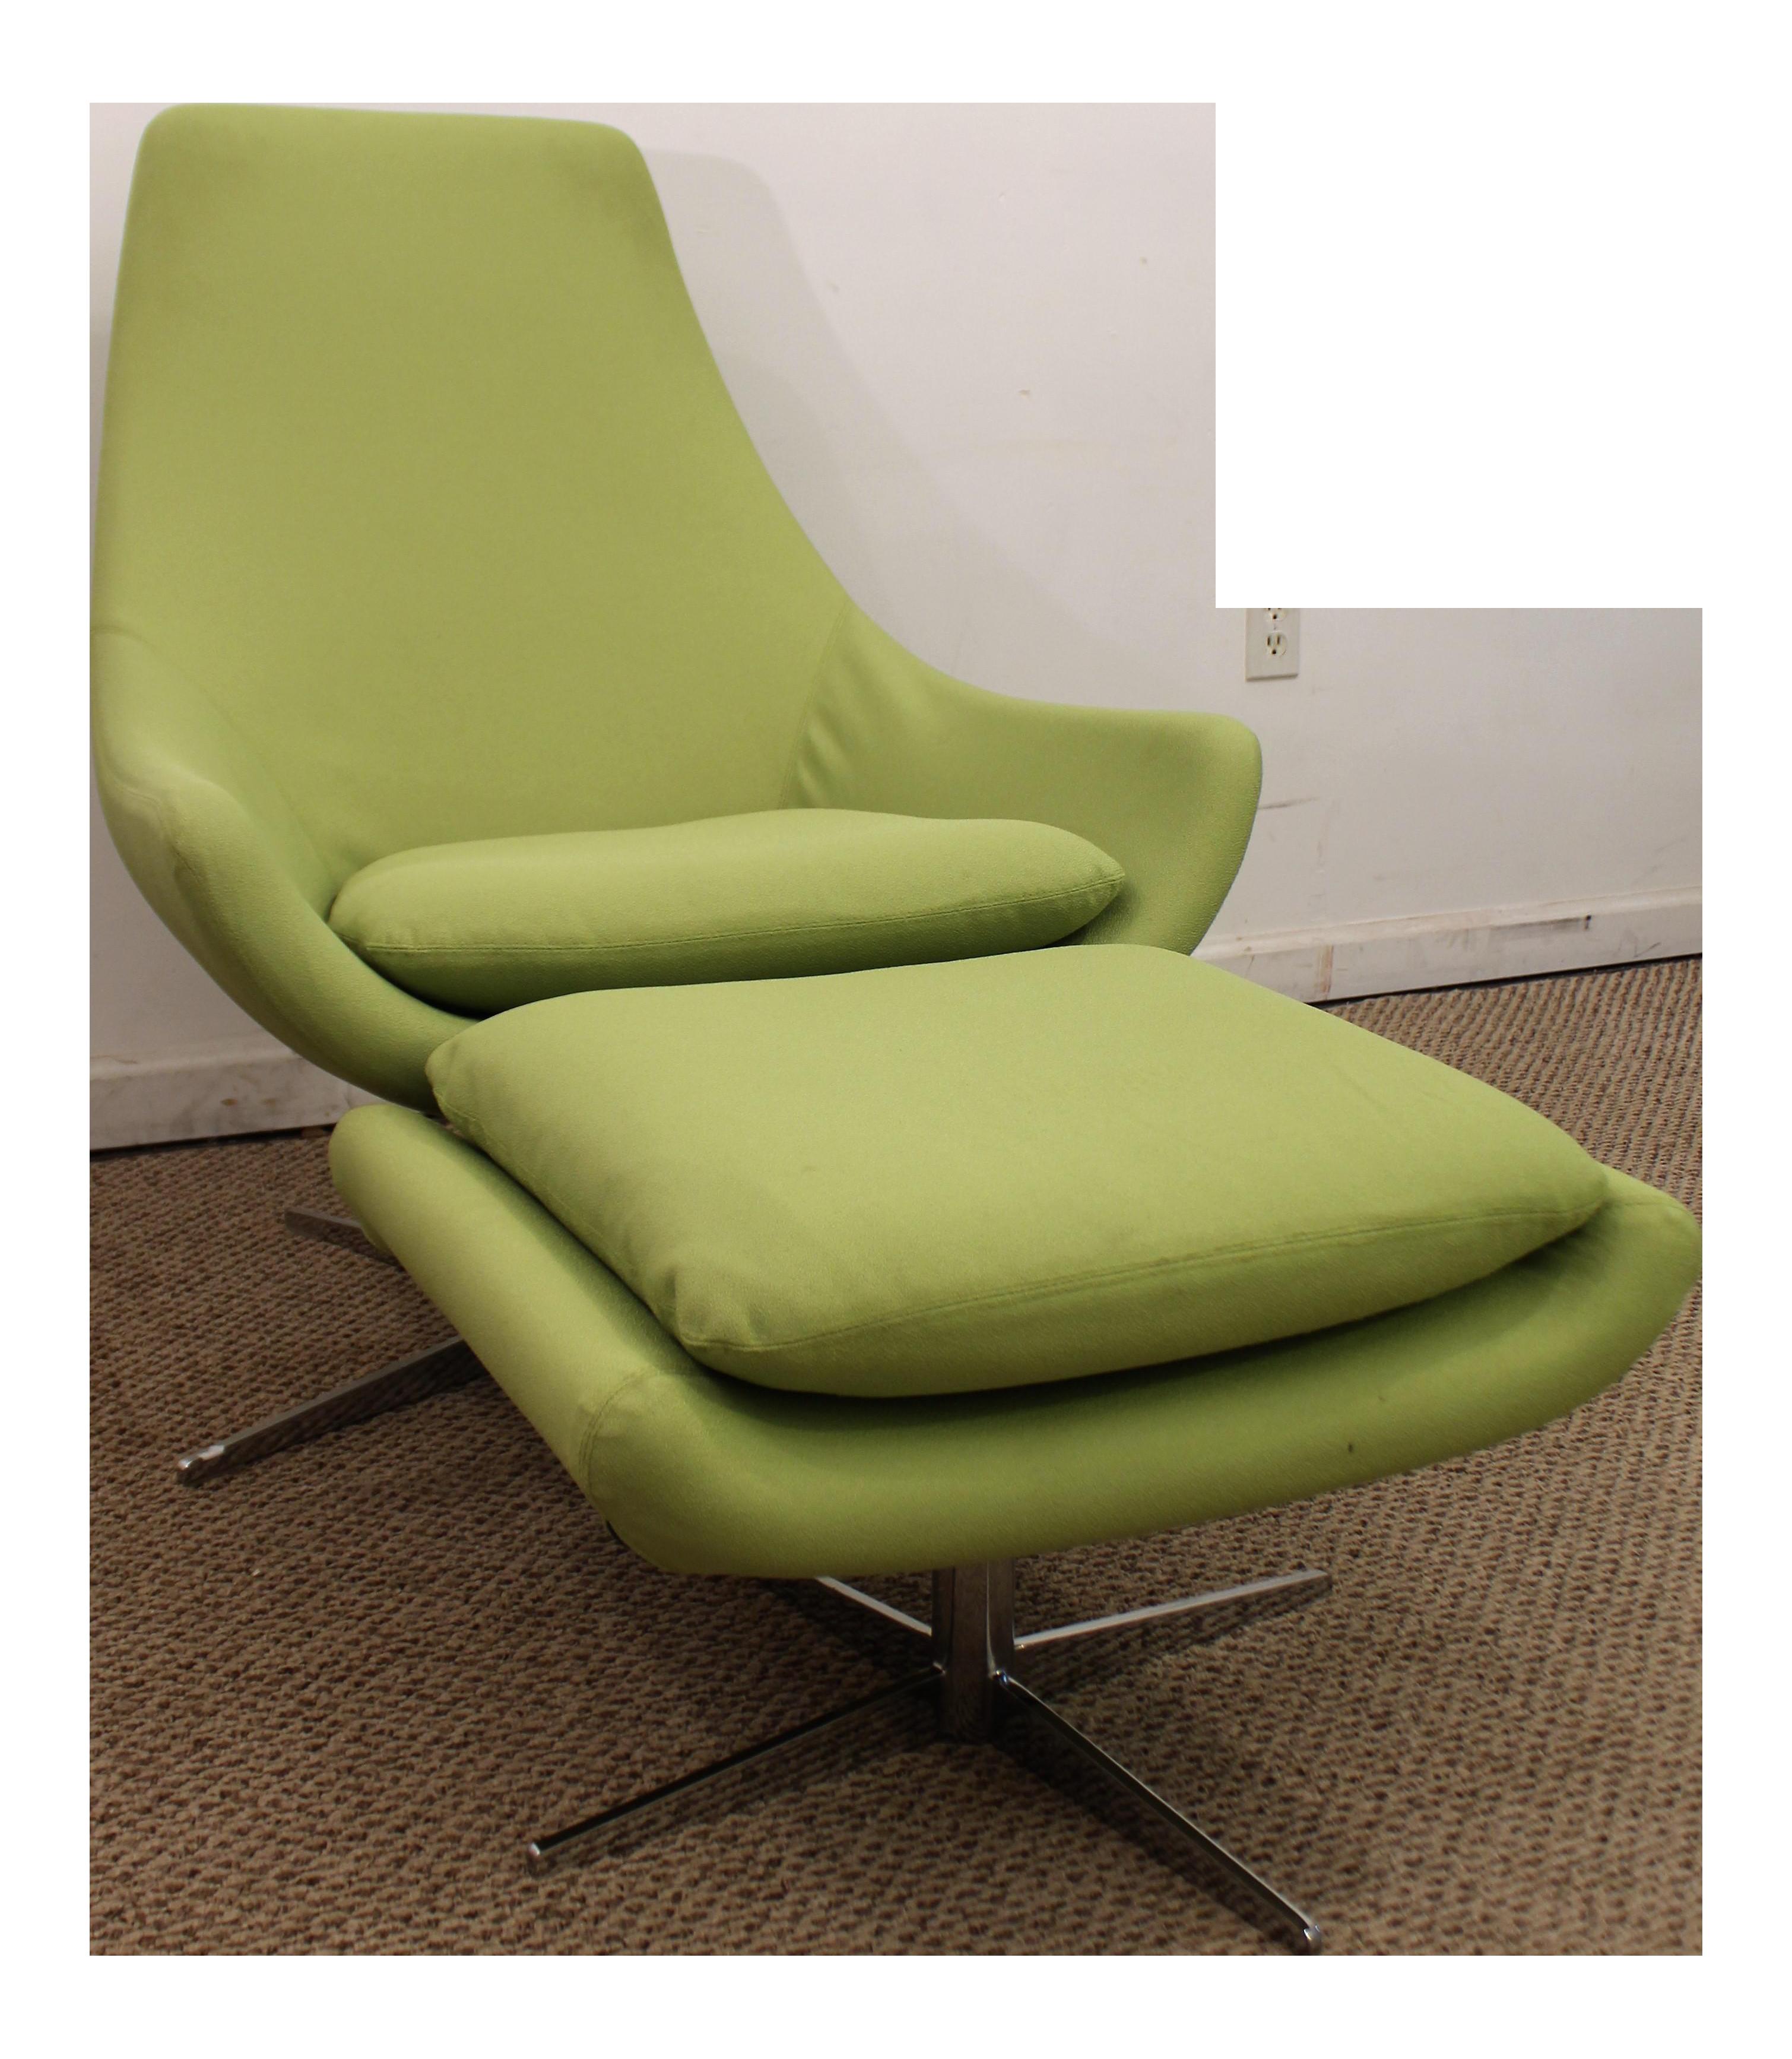 Mid Century Danish Modern Lime Green Swivel Lounge Chair Ottoman